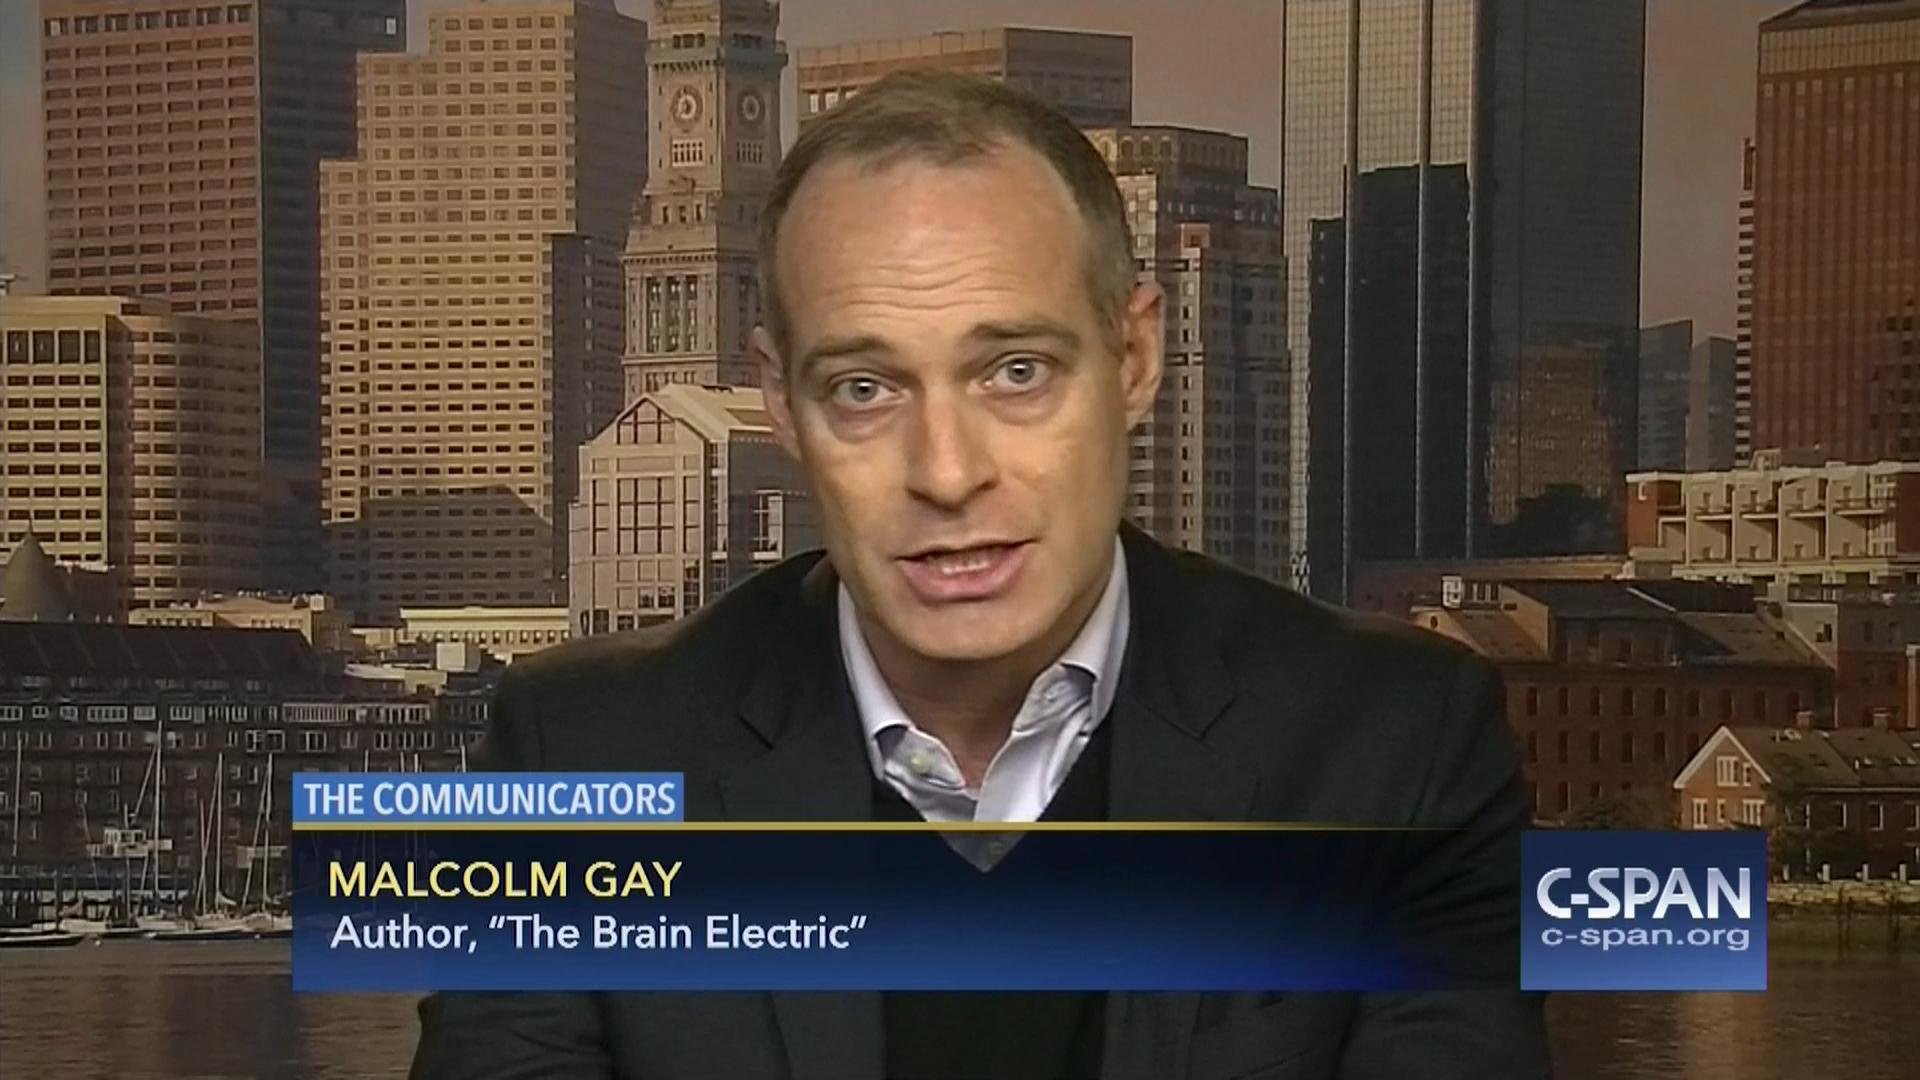 Gay malcolm